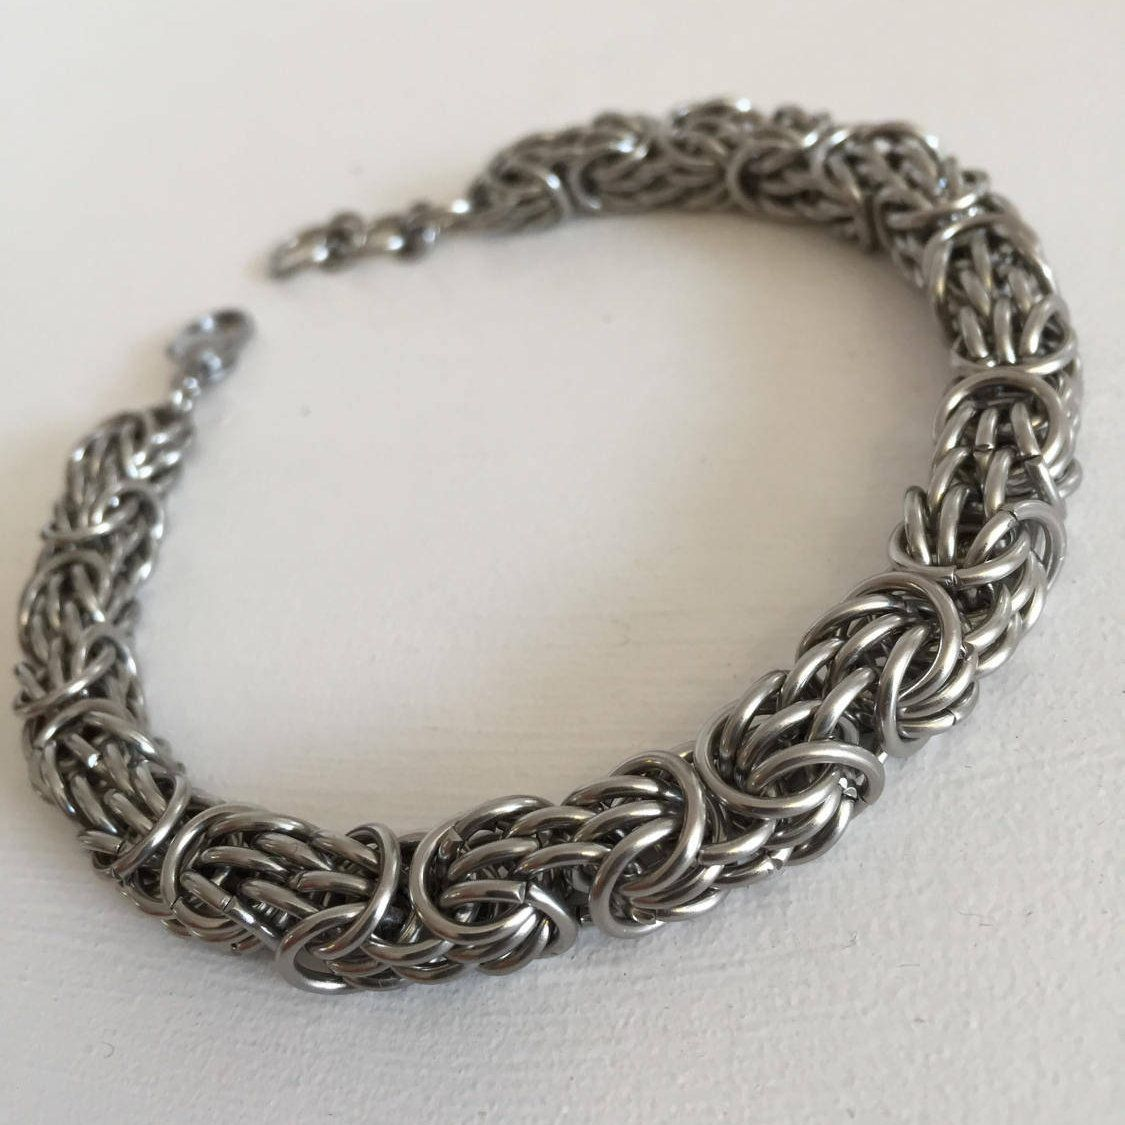 Large steel bracelet hipster mens jewelry gift idea menus chunky